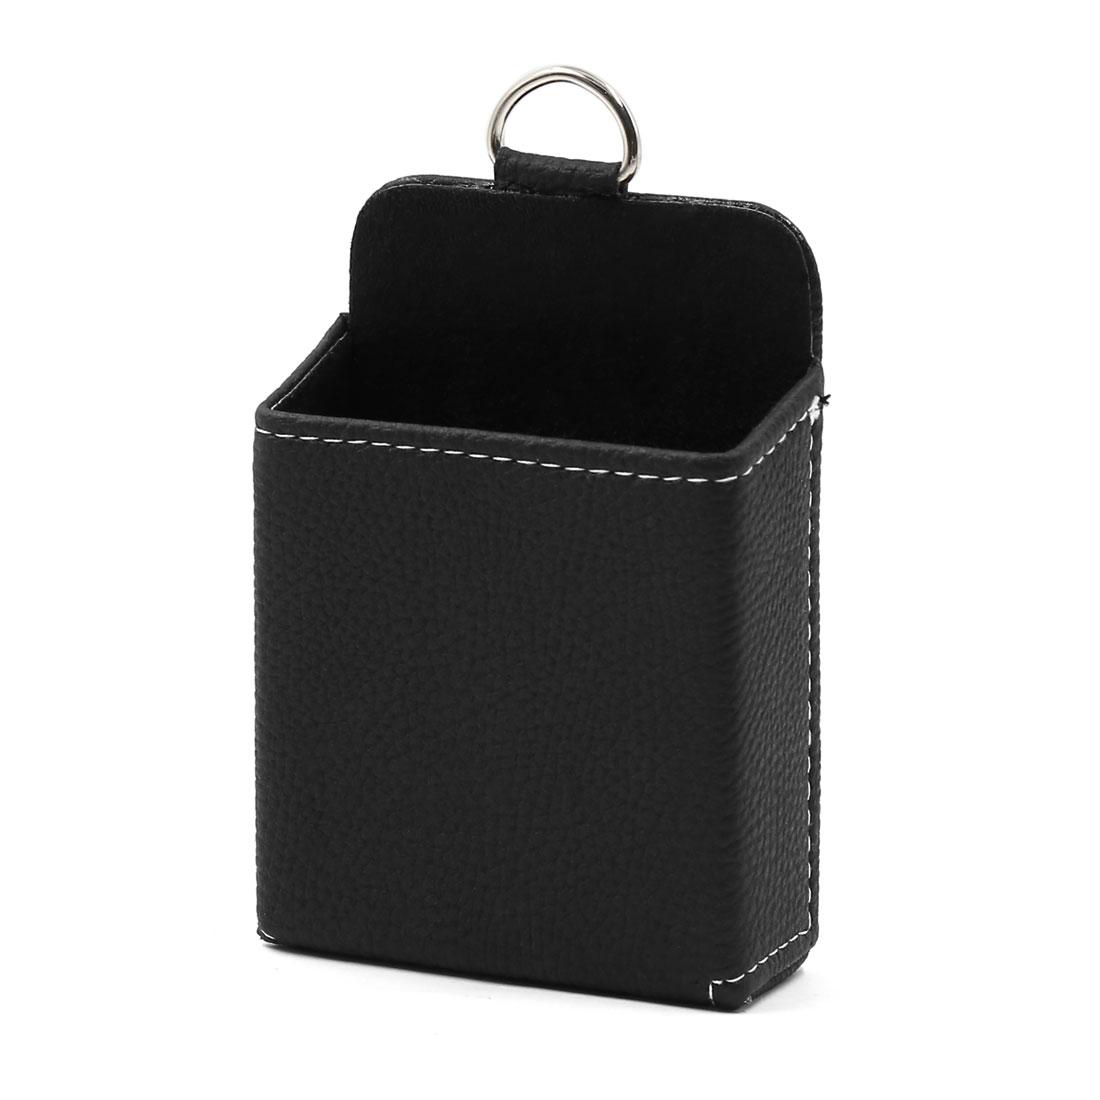 Black Car Air Vent Outlet Phone Pocket Storage Box Organizer Debris Bag Holder Pouch